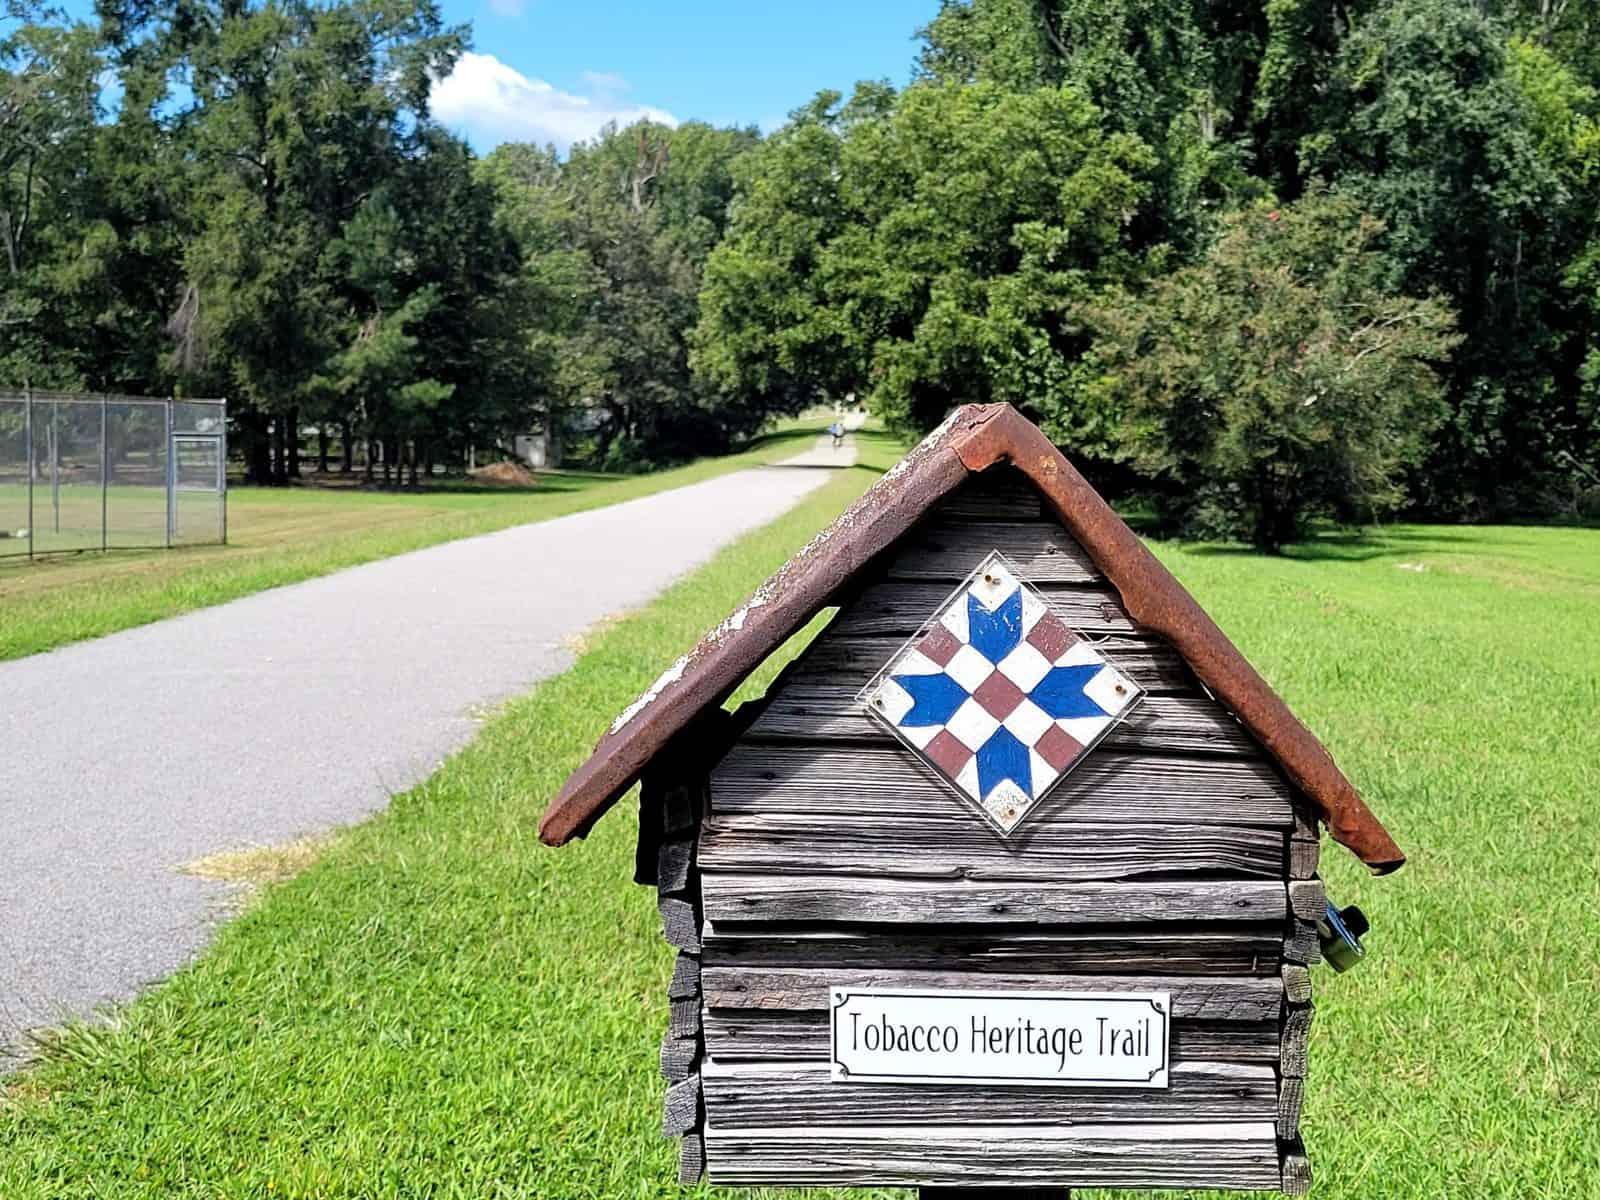 tobacco heritage trail is paved between brodnax and la crosse